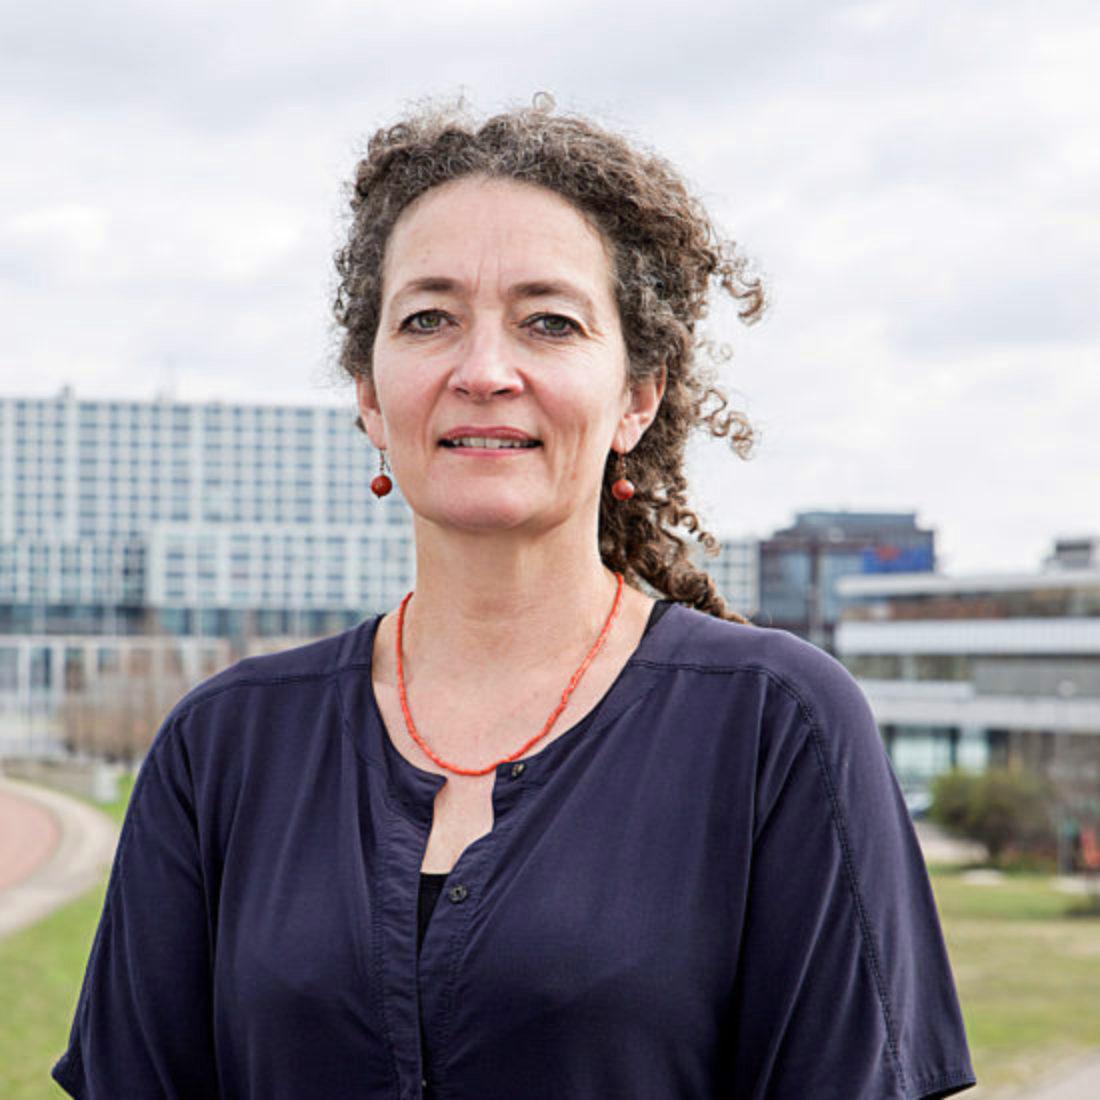 Ruth Veldhuijzen van Zanten